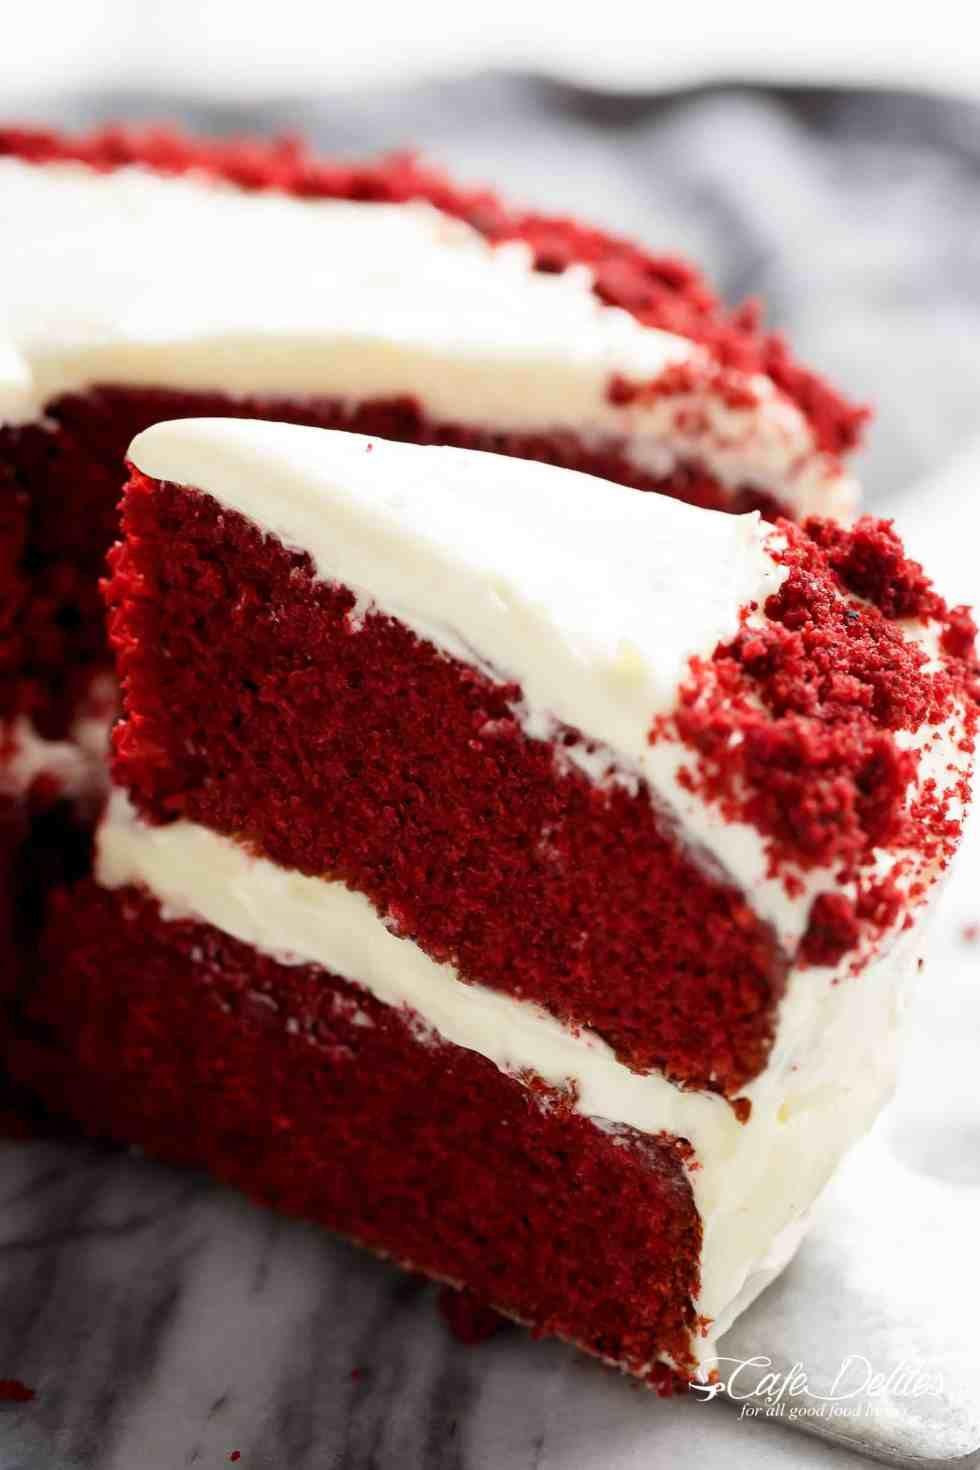 Best Red Velvet Cake Best Red Velvet Cake Red Velvet Cake Recipe Cake Cafe